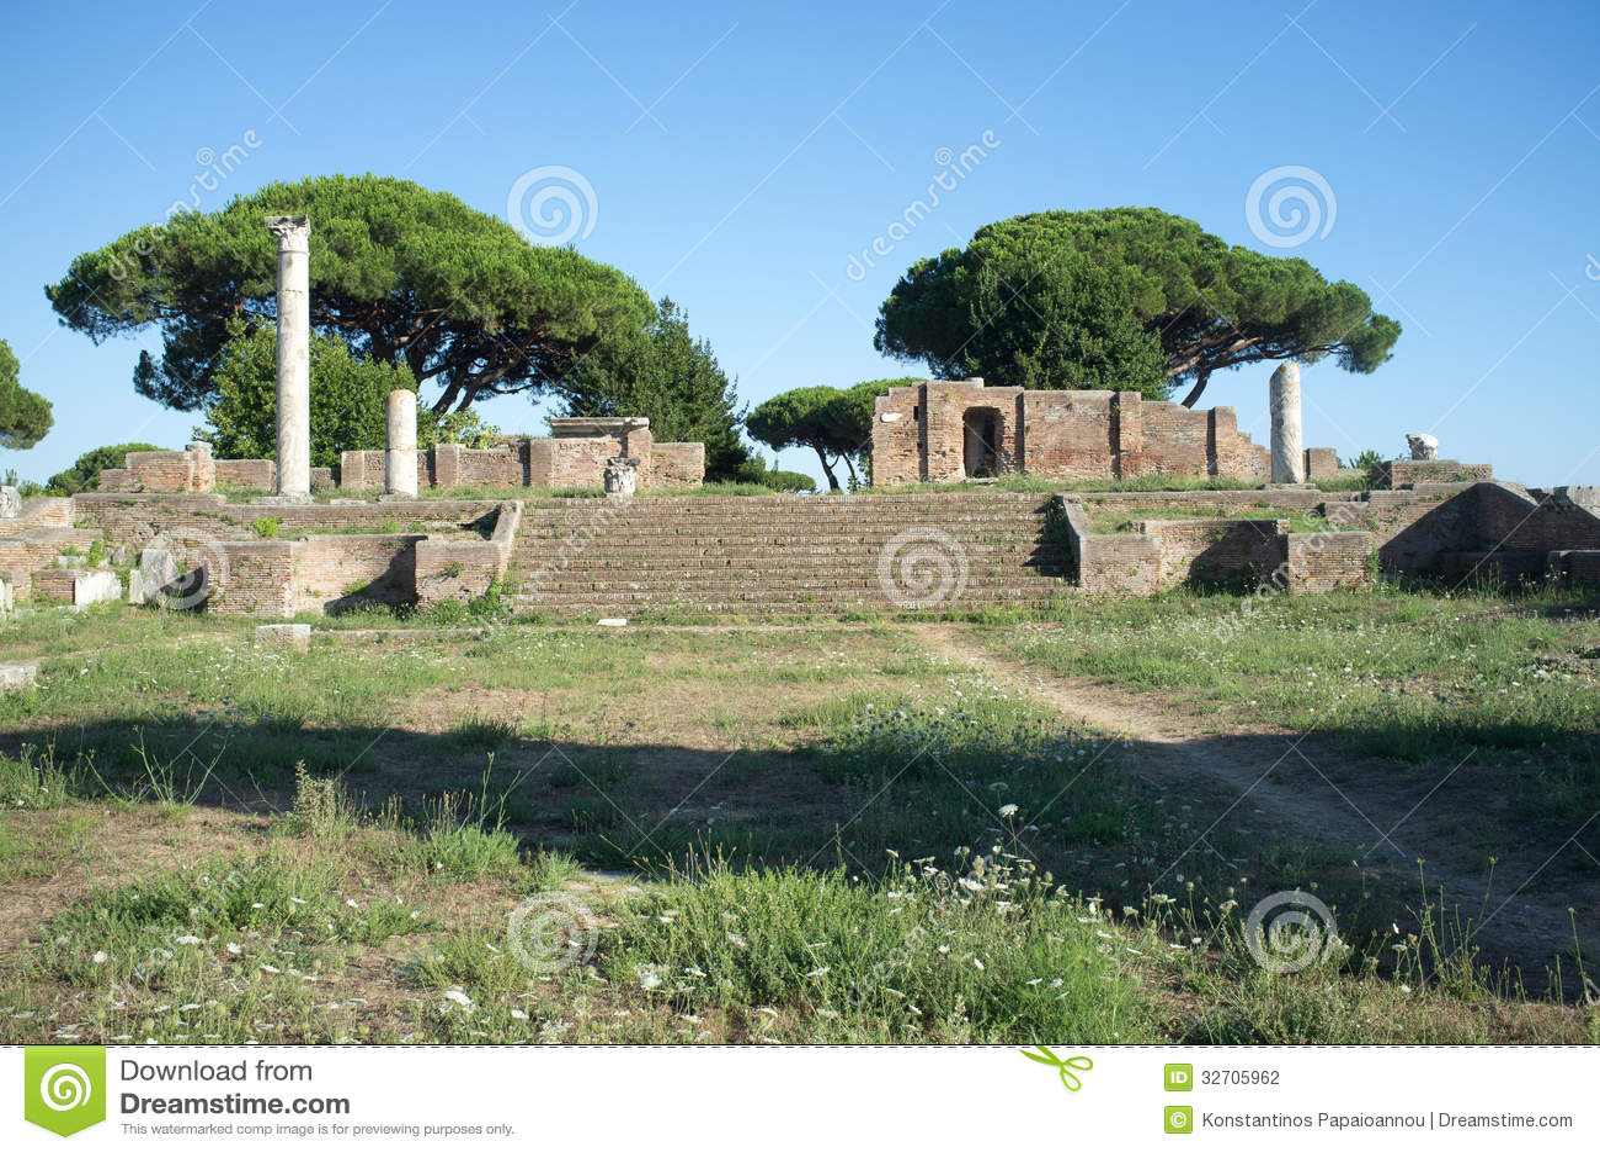 Ostia antica in rome stock photography image 32705962 for Mr arredamenti ostia antica